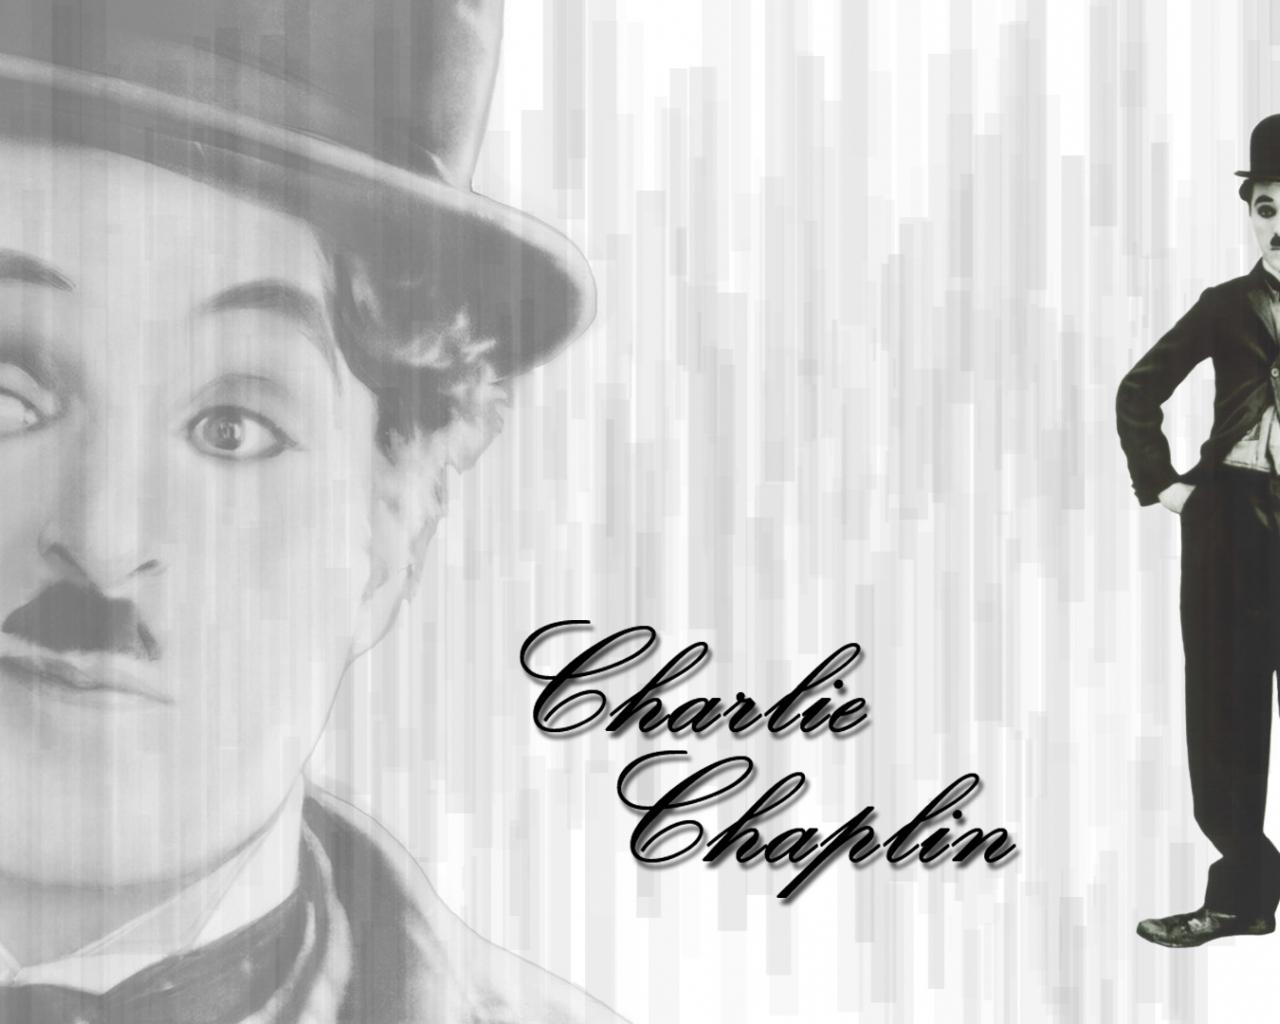 1920x1080px charlie chaplin wallpaper wallpapersafari charlie chaplin wallpaper charlie chaplin images charlie chaplin wallpaper wallpaper 1920x1080 thecheapjerseys Gallery